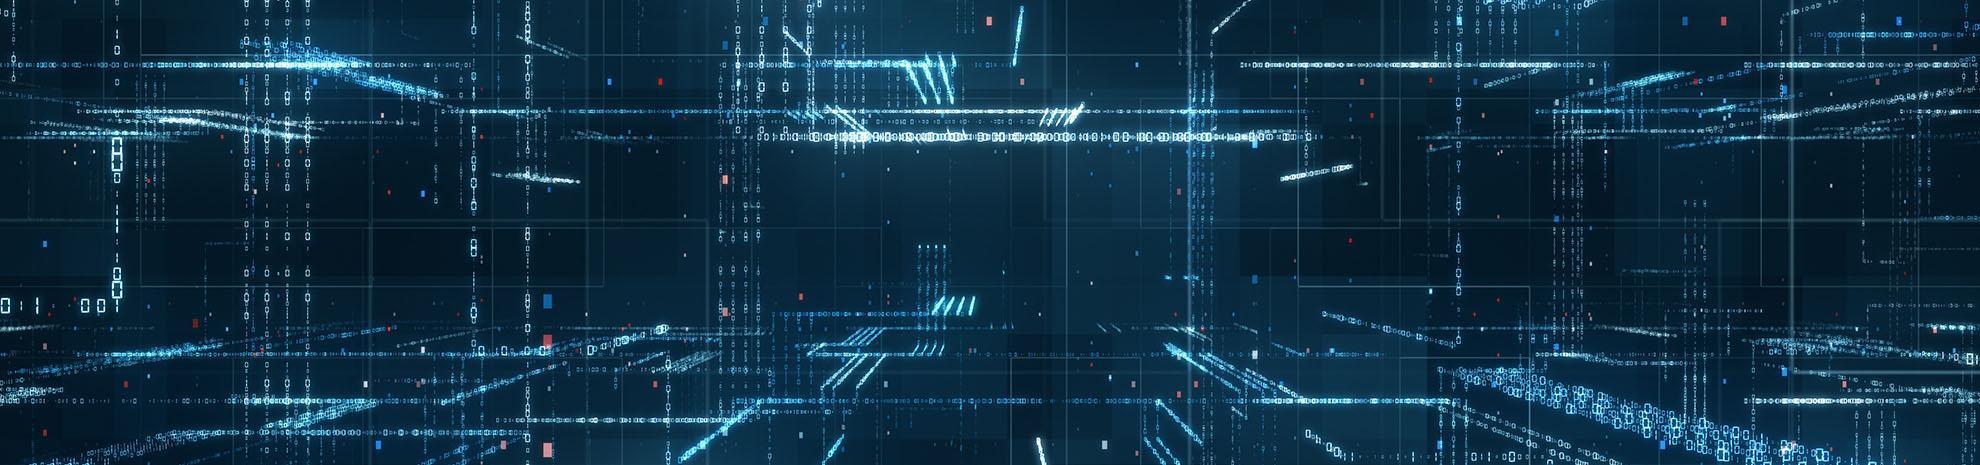 Building a Cloud Security Program with Palo Alto Networks